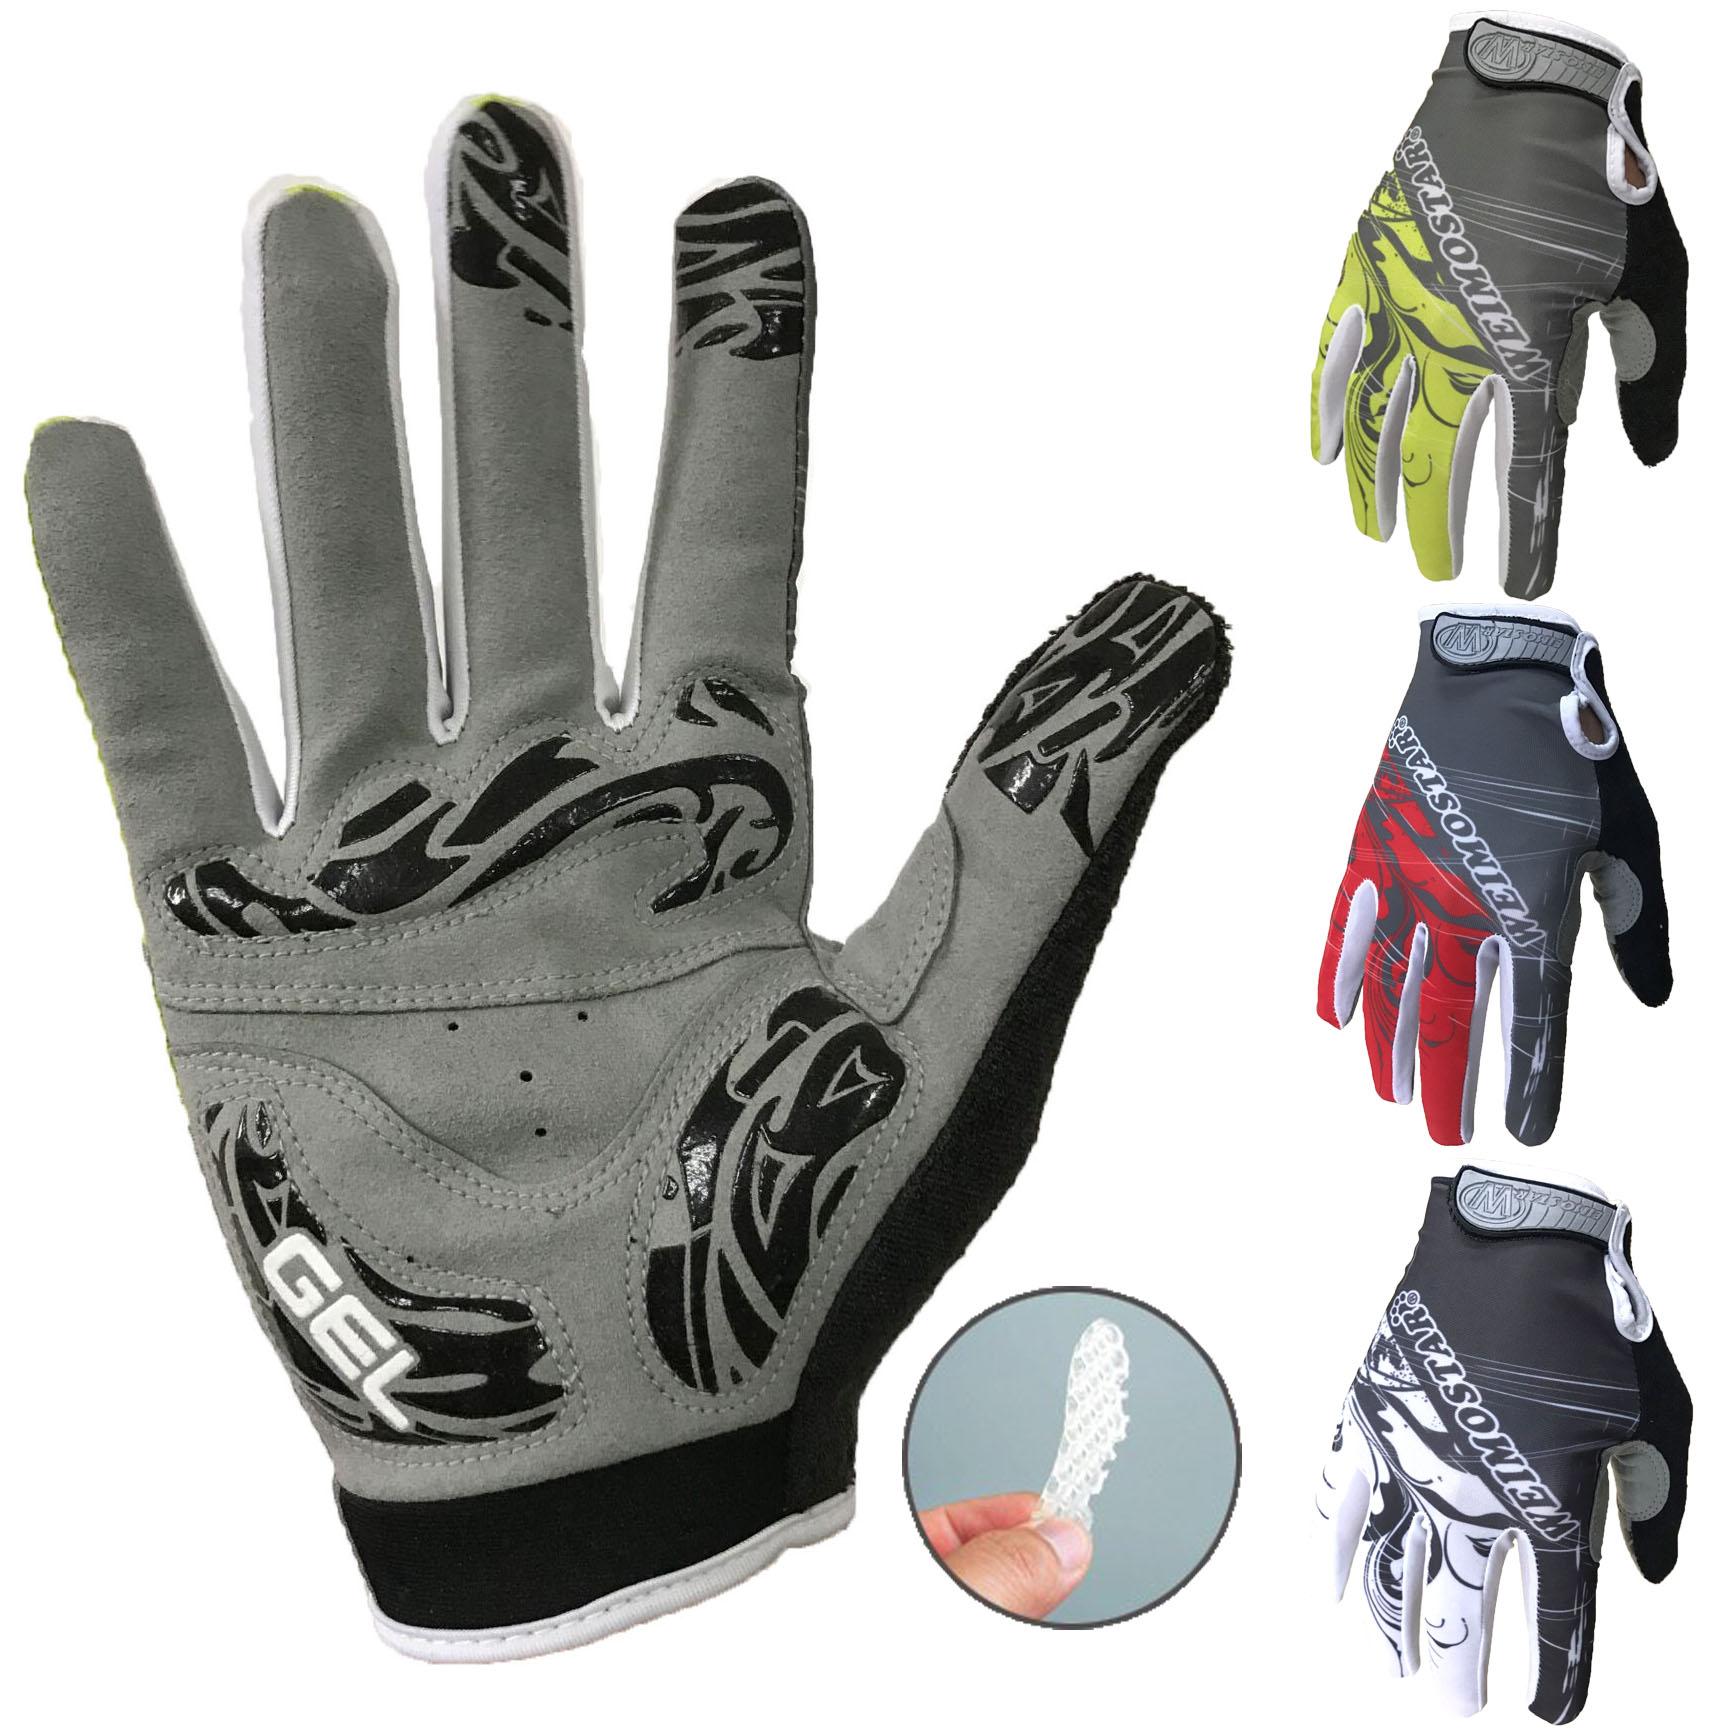 TELEYI Touch Screen Long Full Fingers Gel Cycling Gloves Winter Fall Women Men Bicycle Gloves MTB Road Bike Riding Racing Gloves